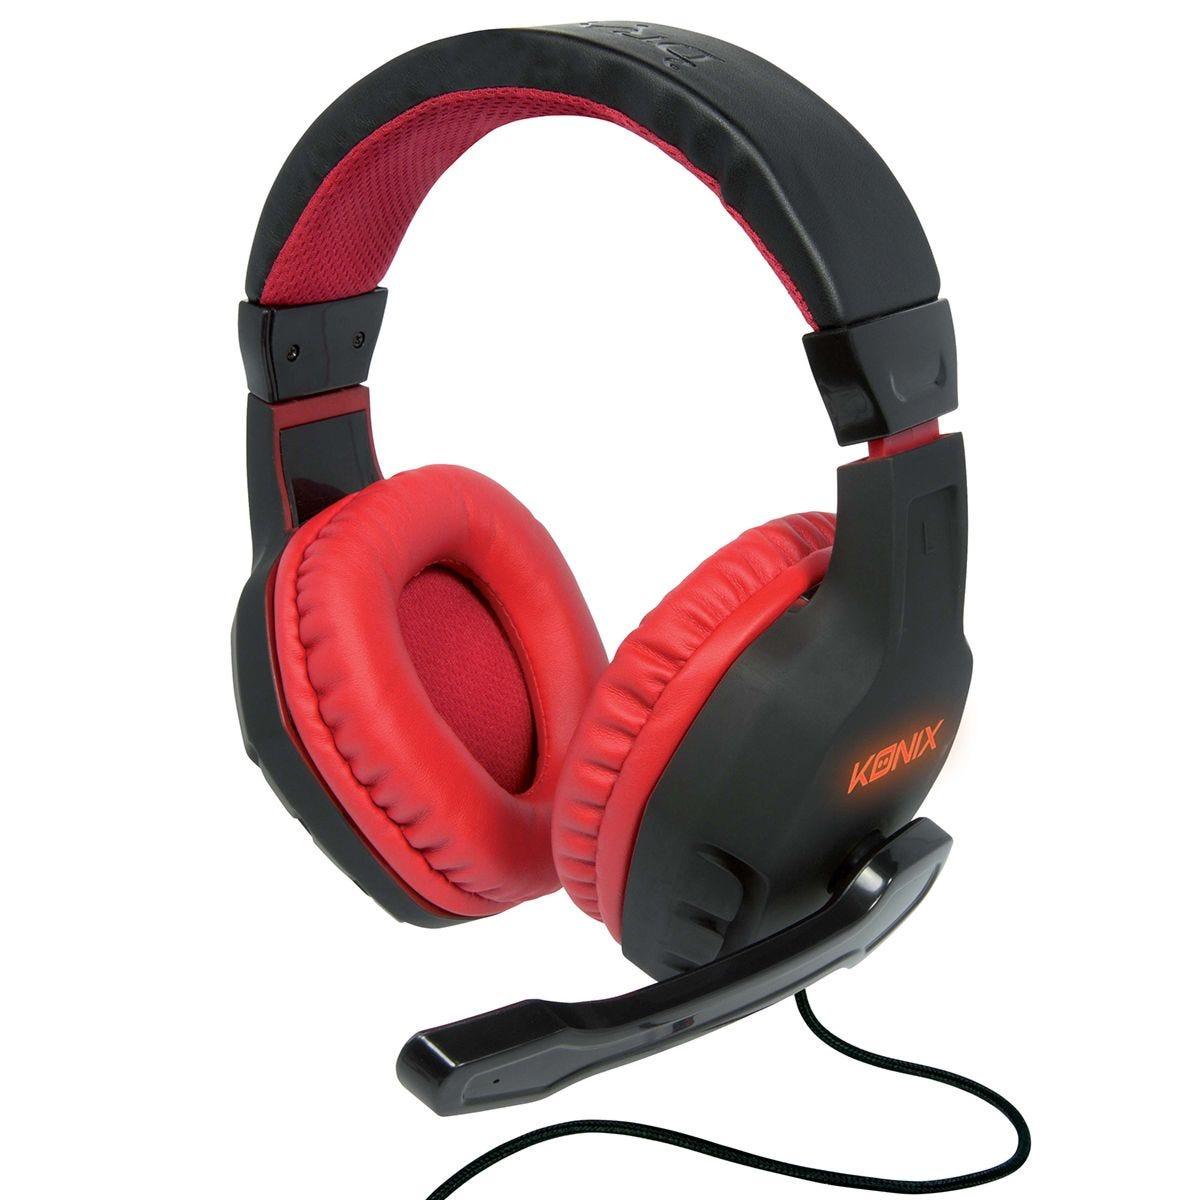 Konix Drakkar Skald Gaming Headset - Black/Red